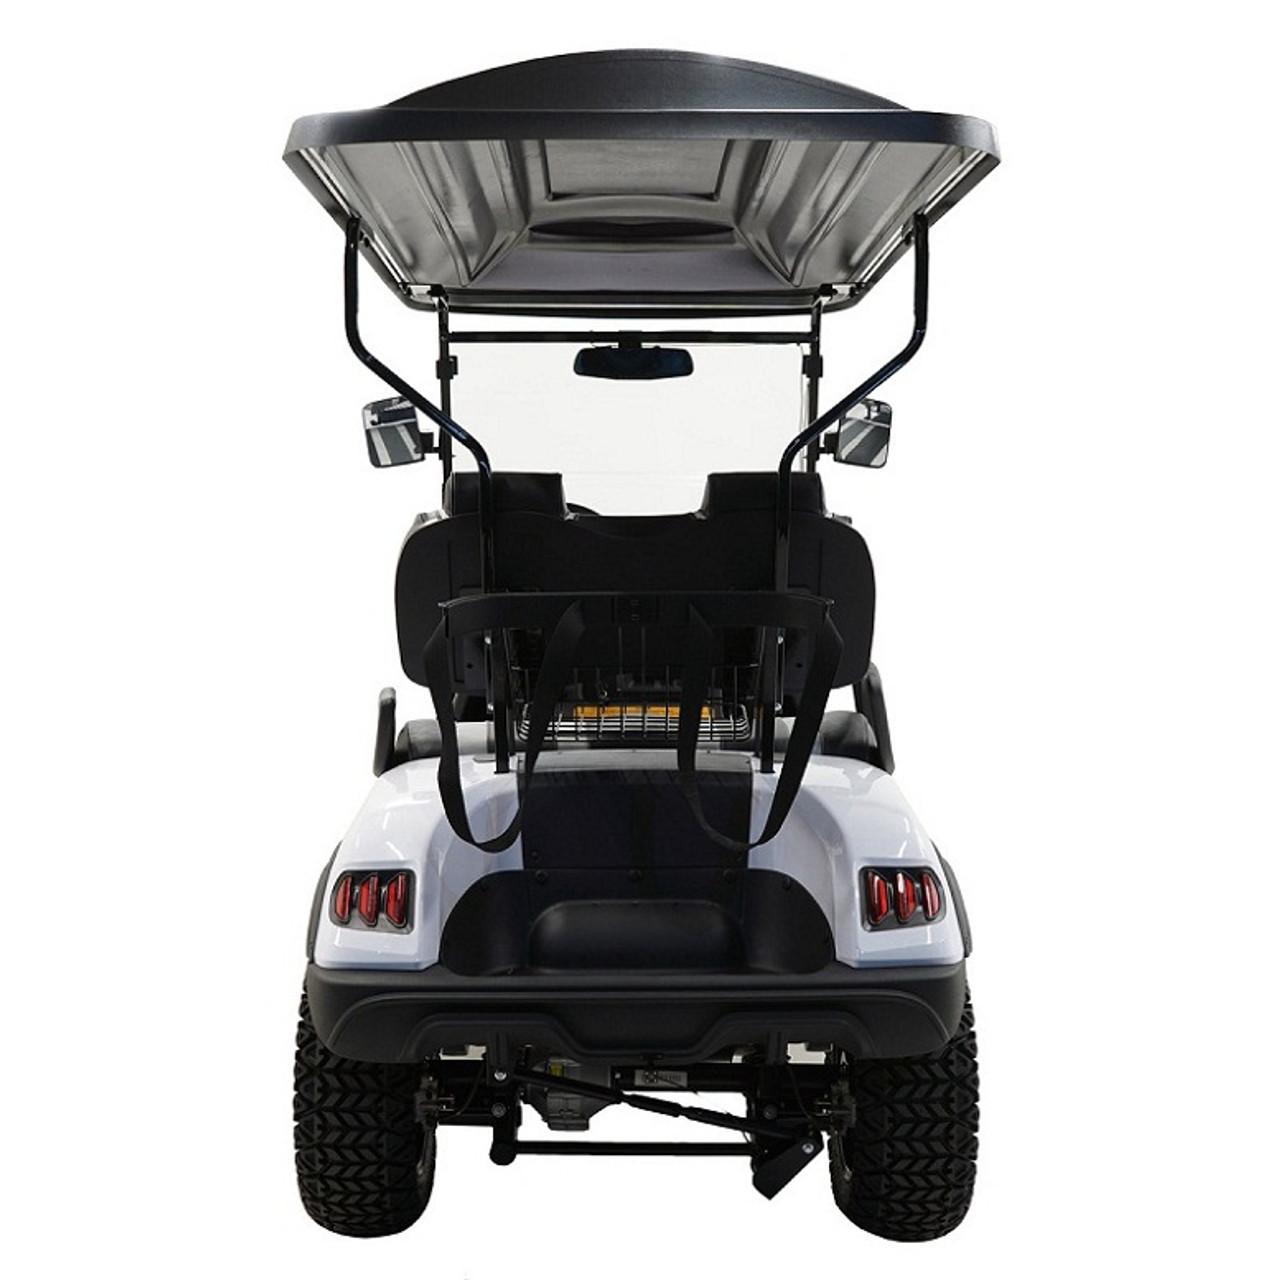 MASSIMO MGC2 48V GOLF CART UTV, 48V AC MOTOR